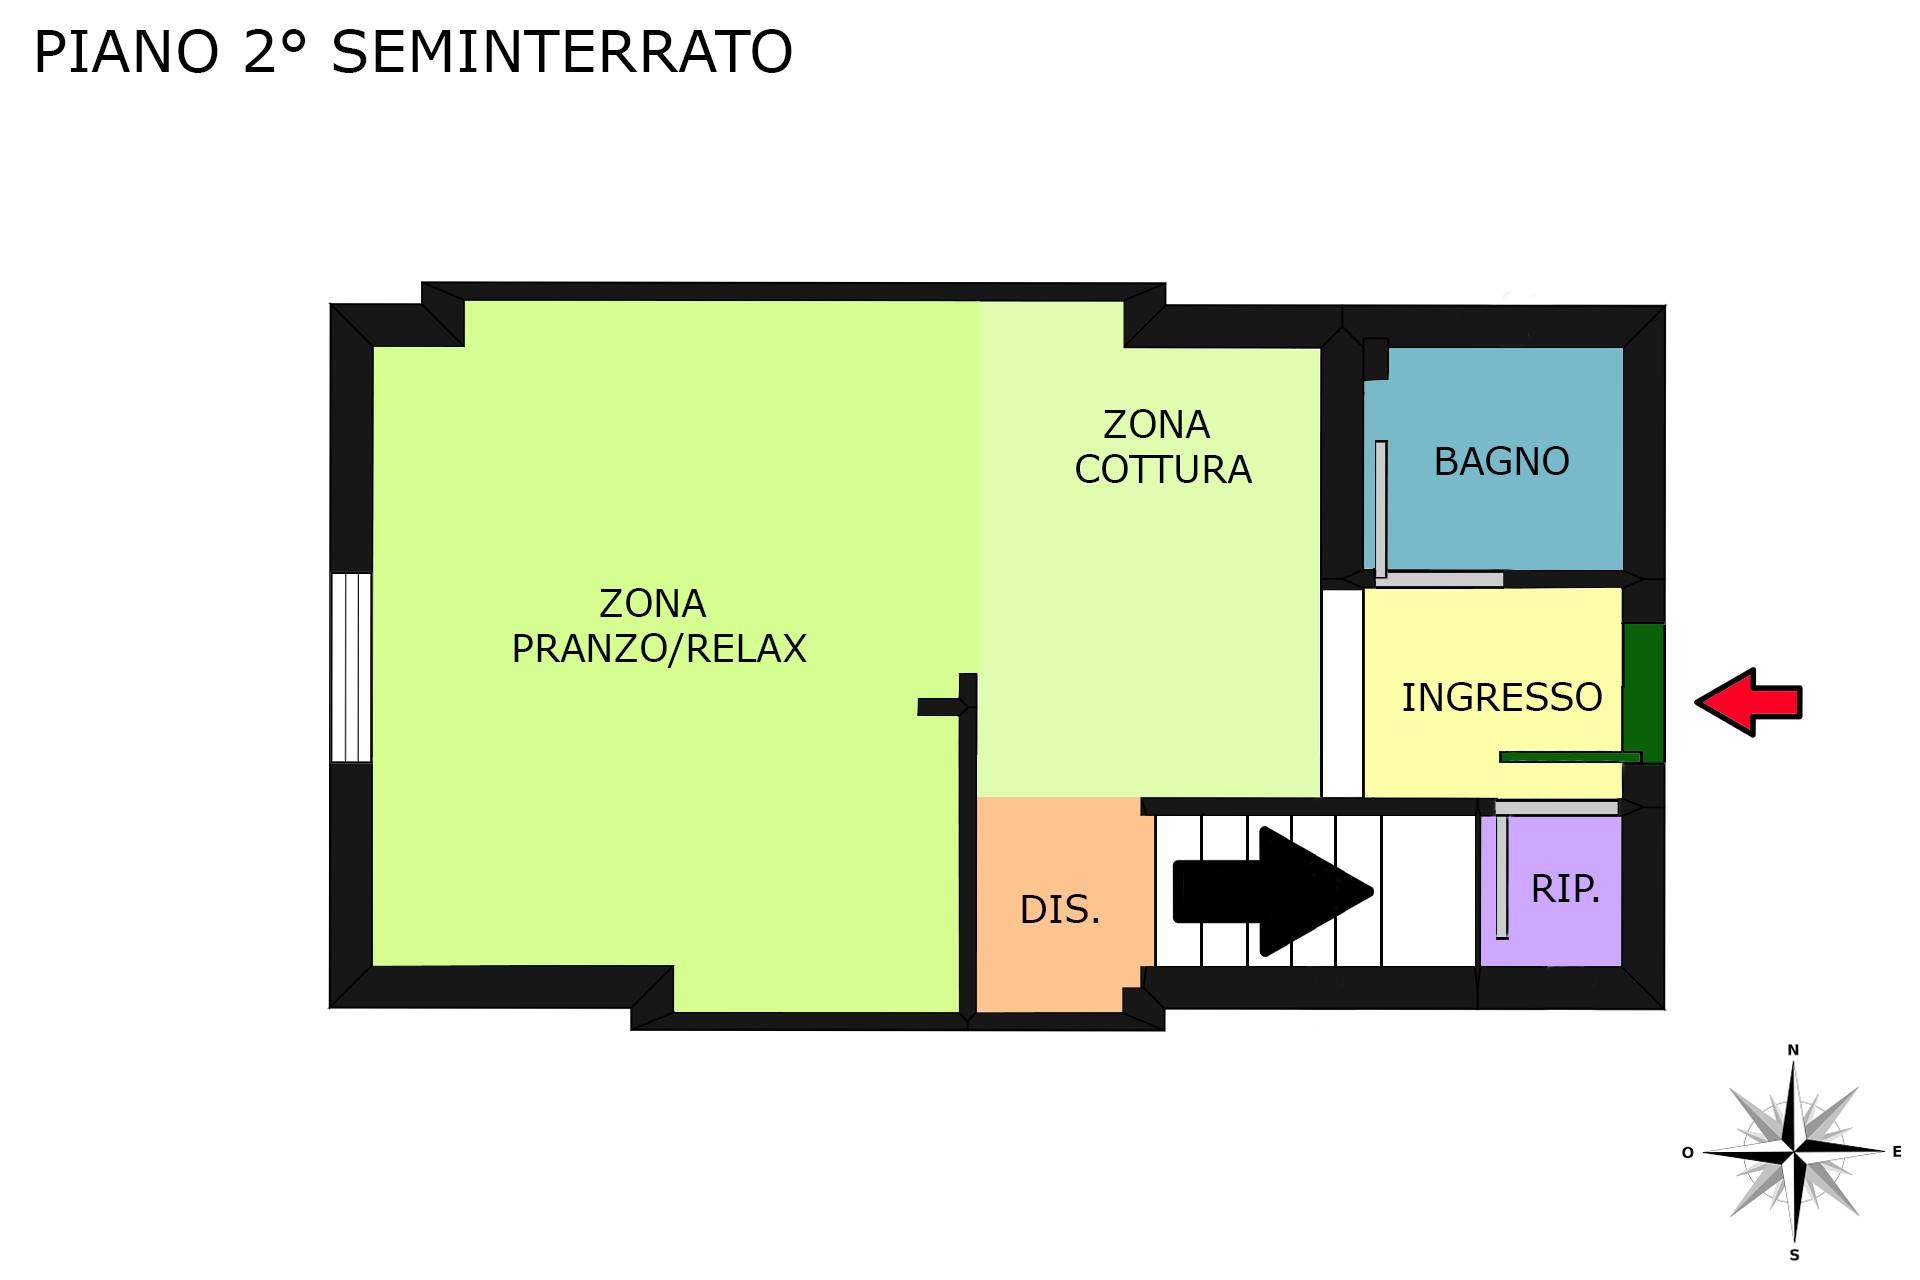 Planimetria 2D piano 2° seminterrato